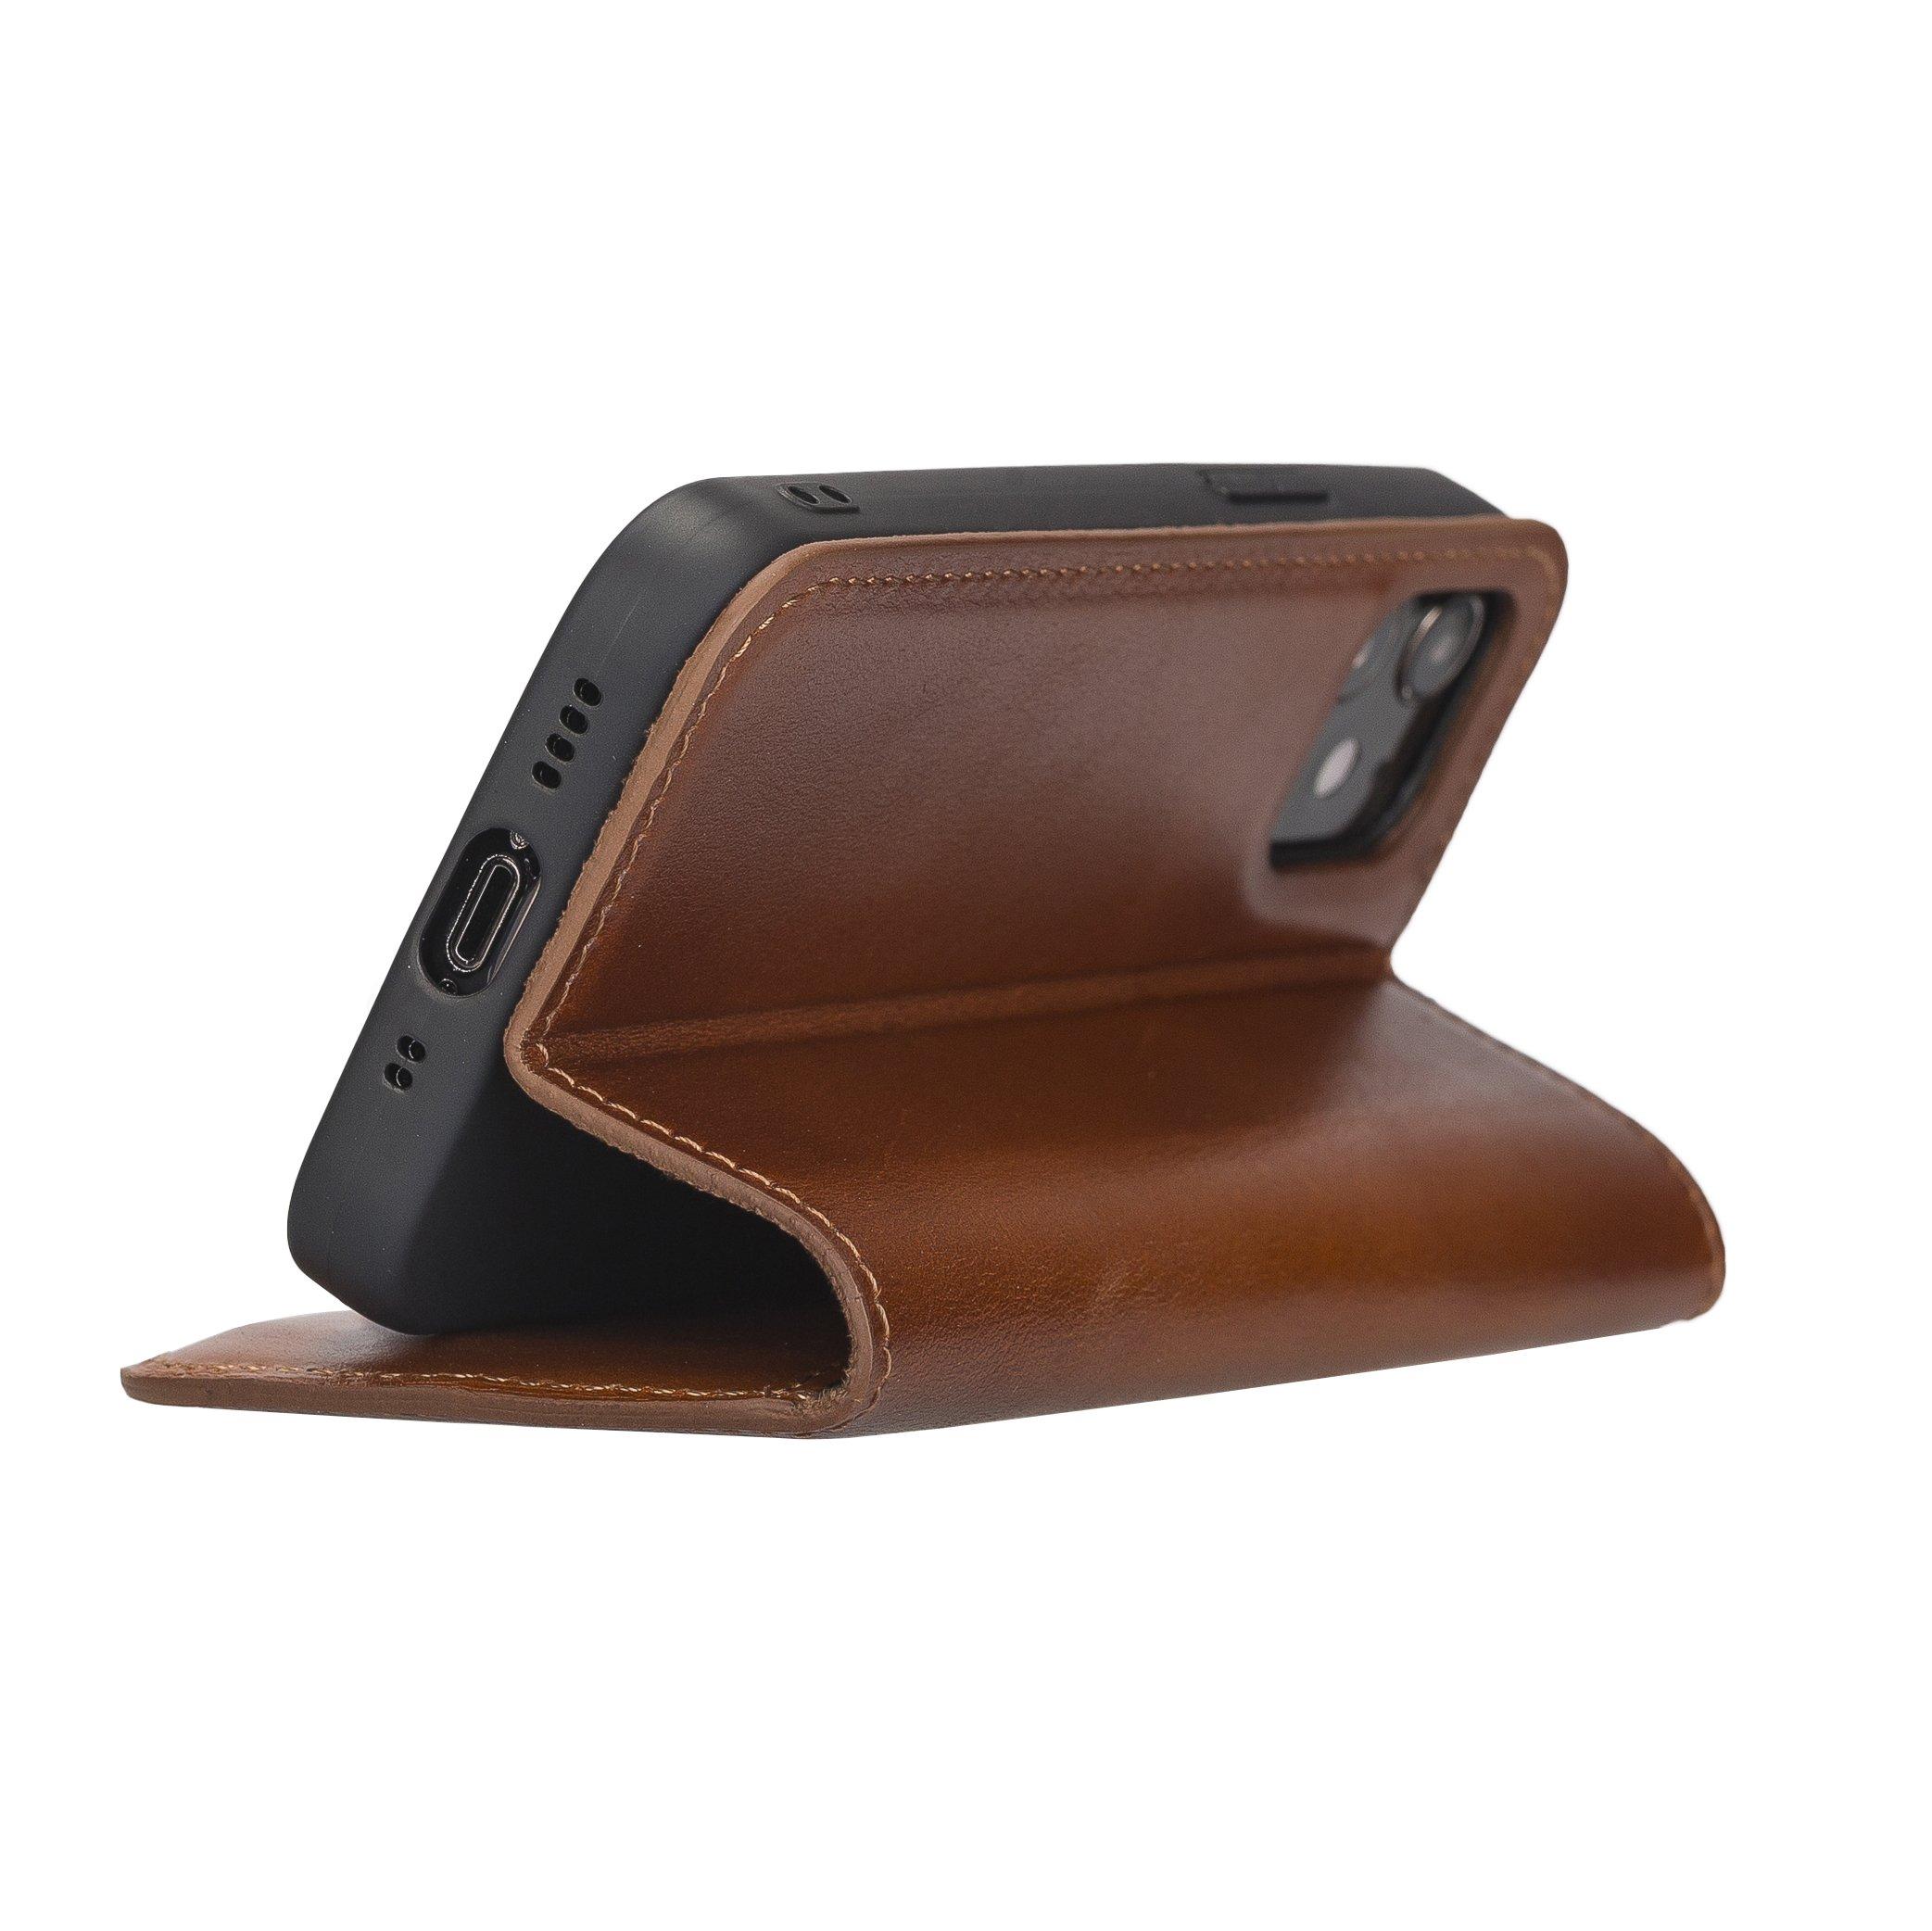 Lederhülle für iPhone 12 Mini (Cognac Braun Burned)